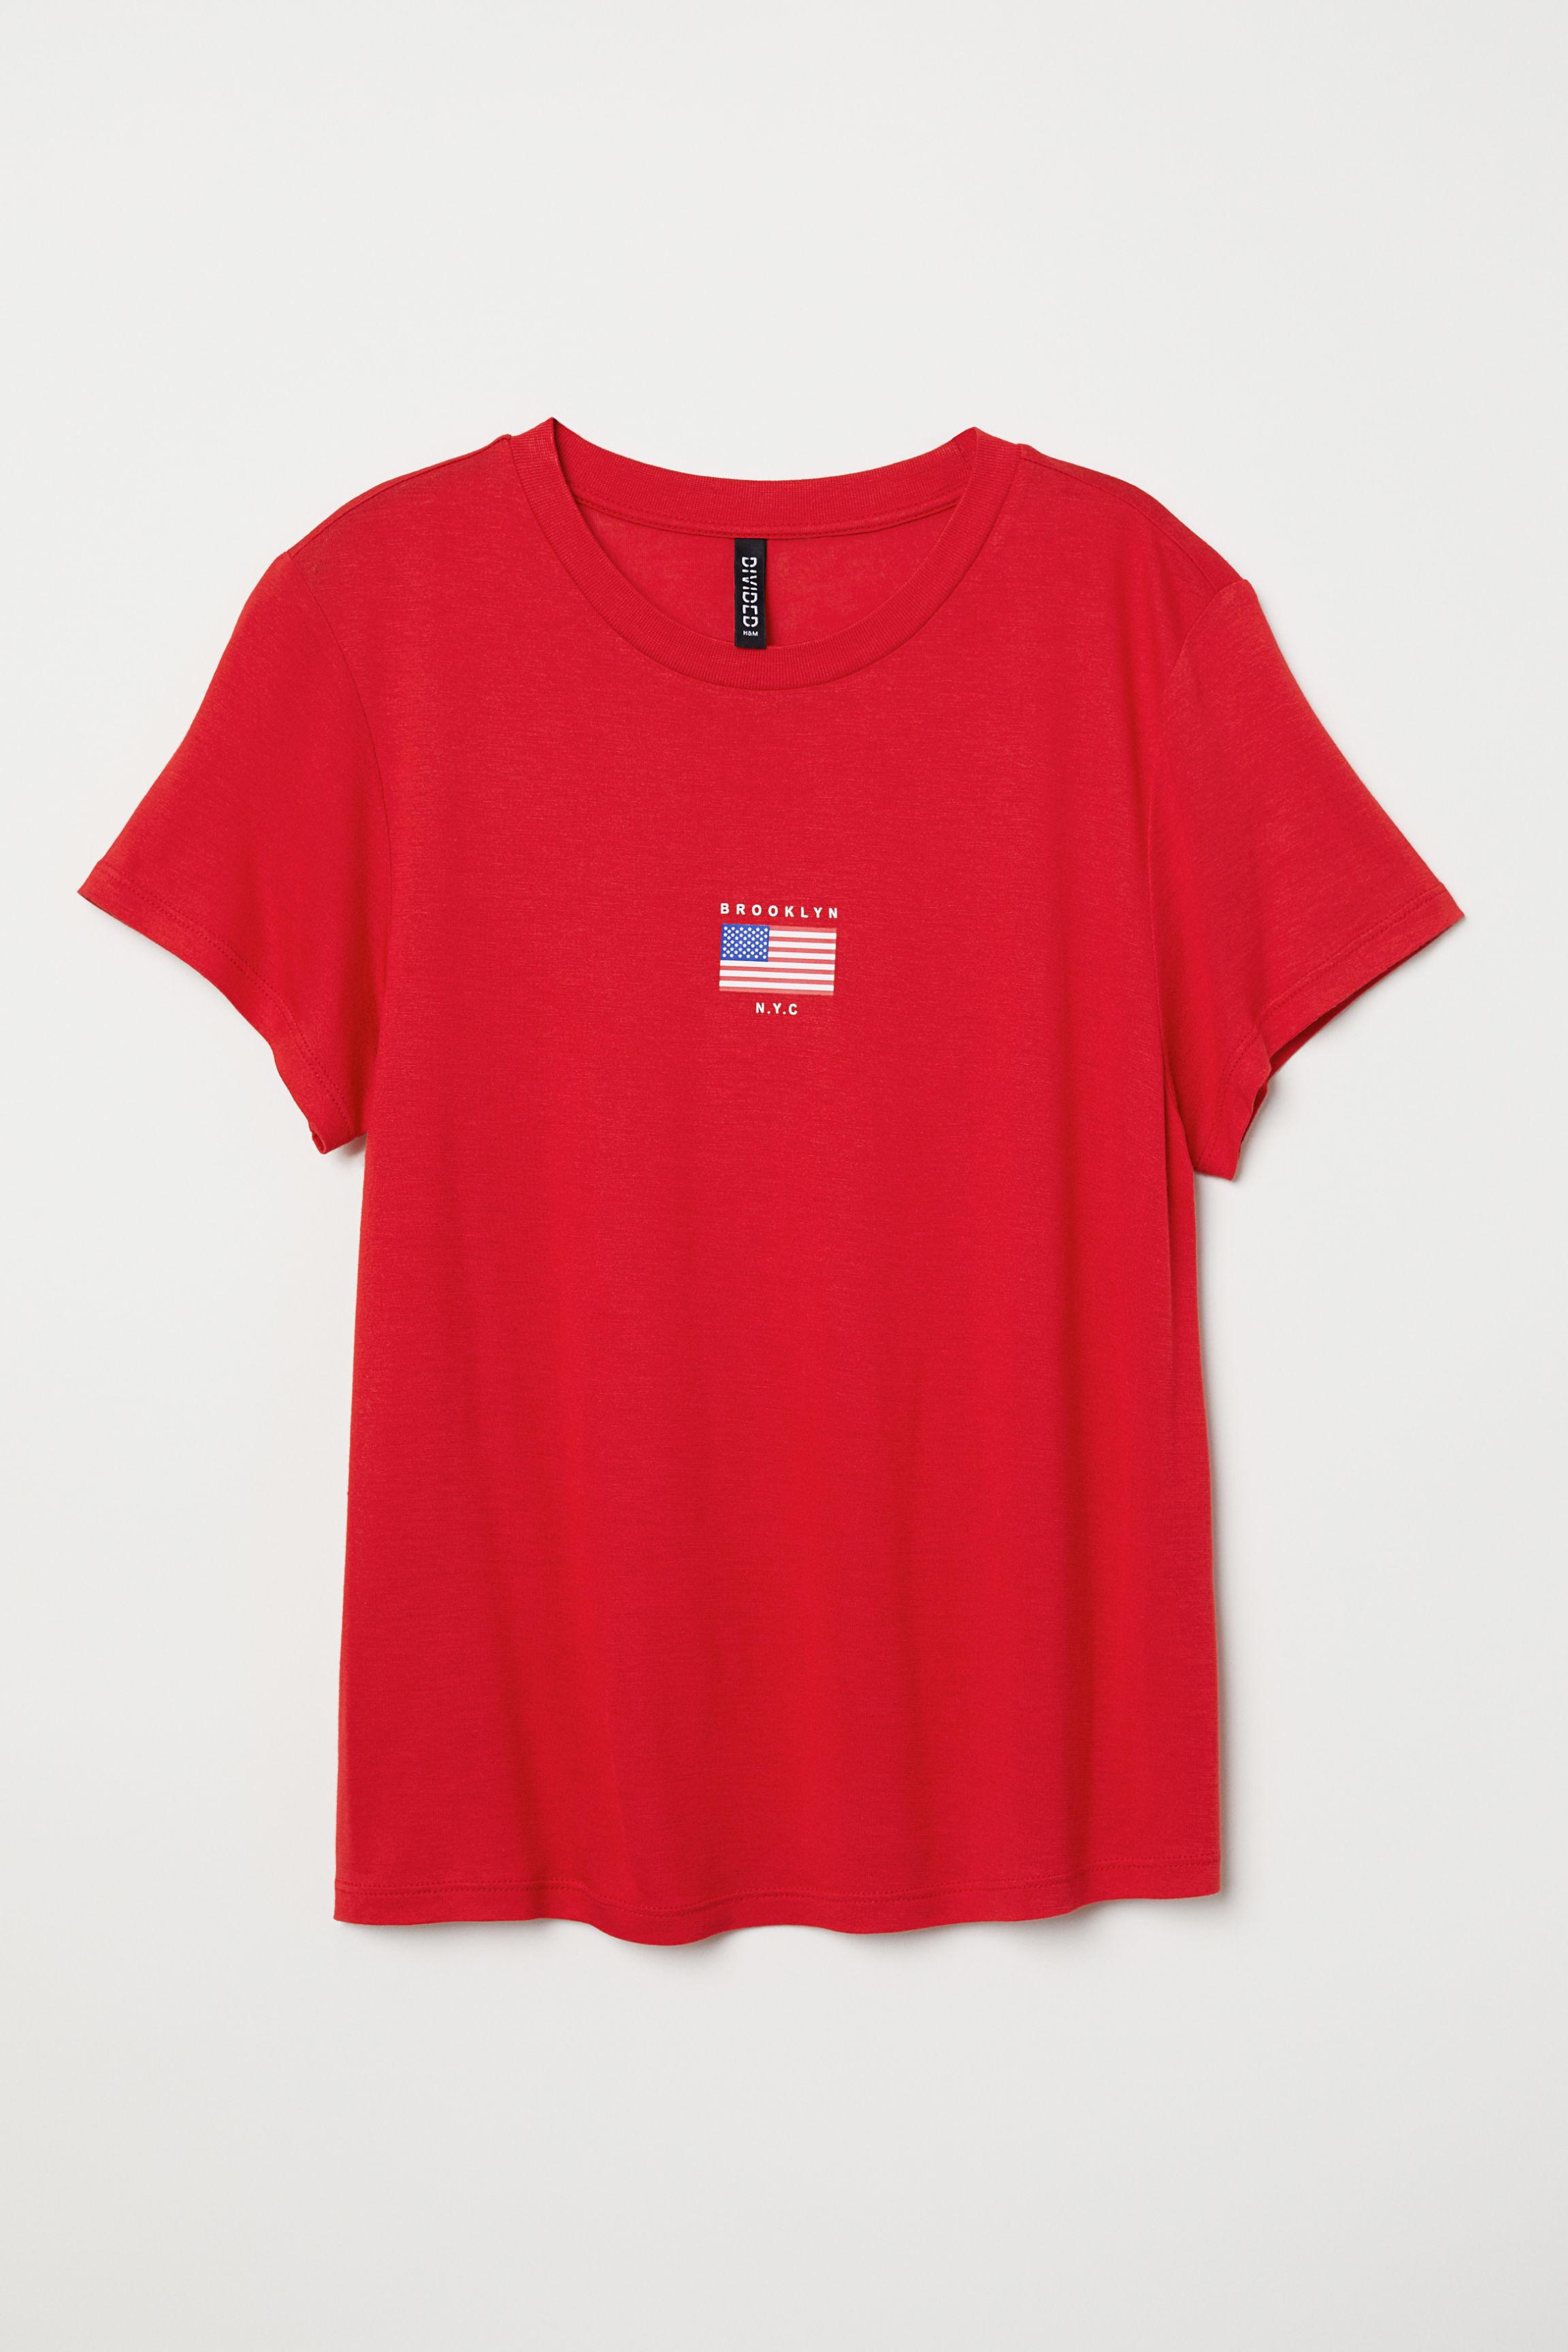 aa6ac5aecbb07f T-shirt with Motif - Red Brooklyn - Ladies